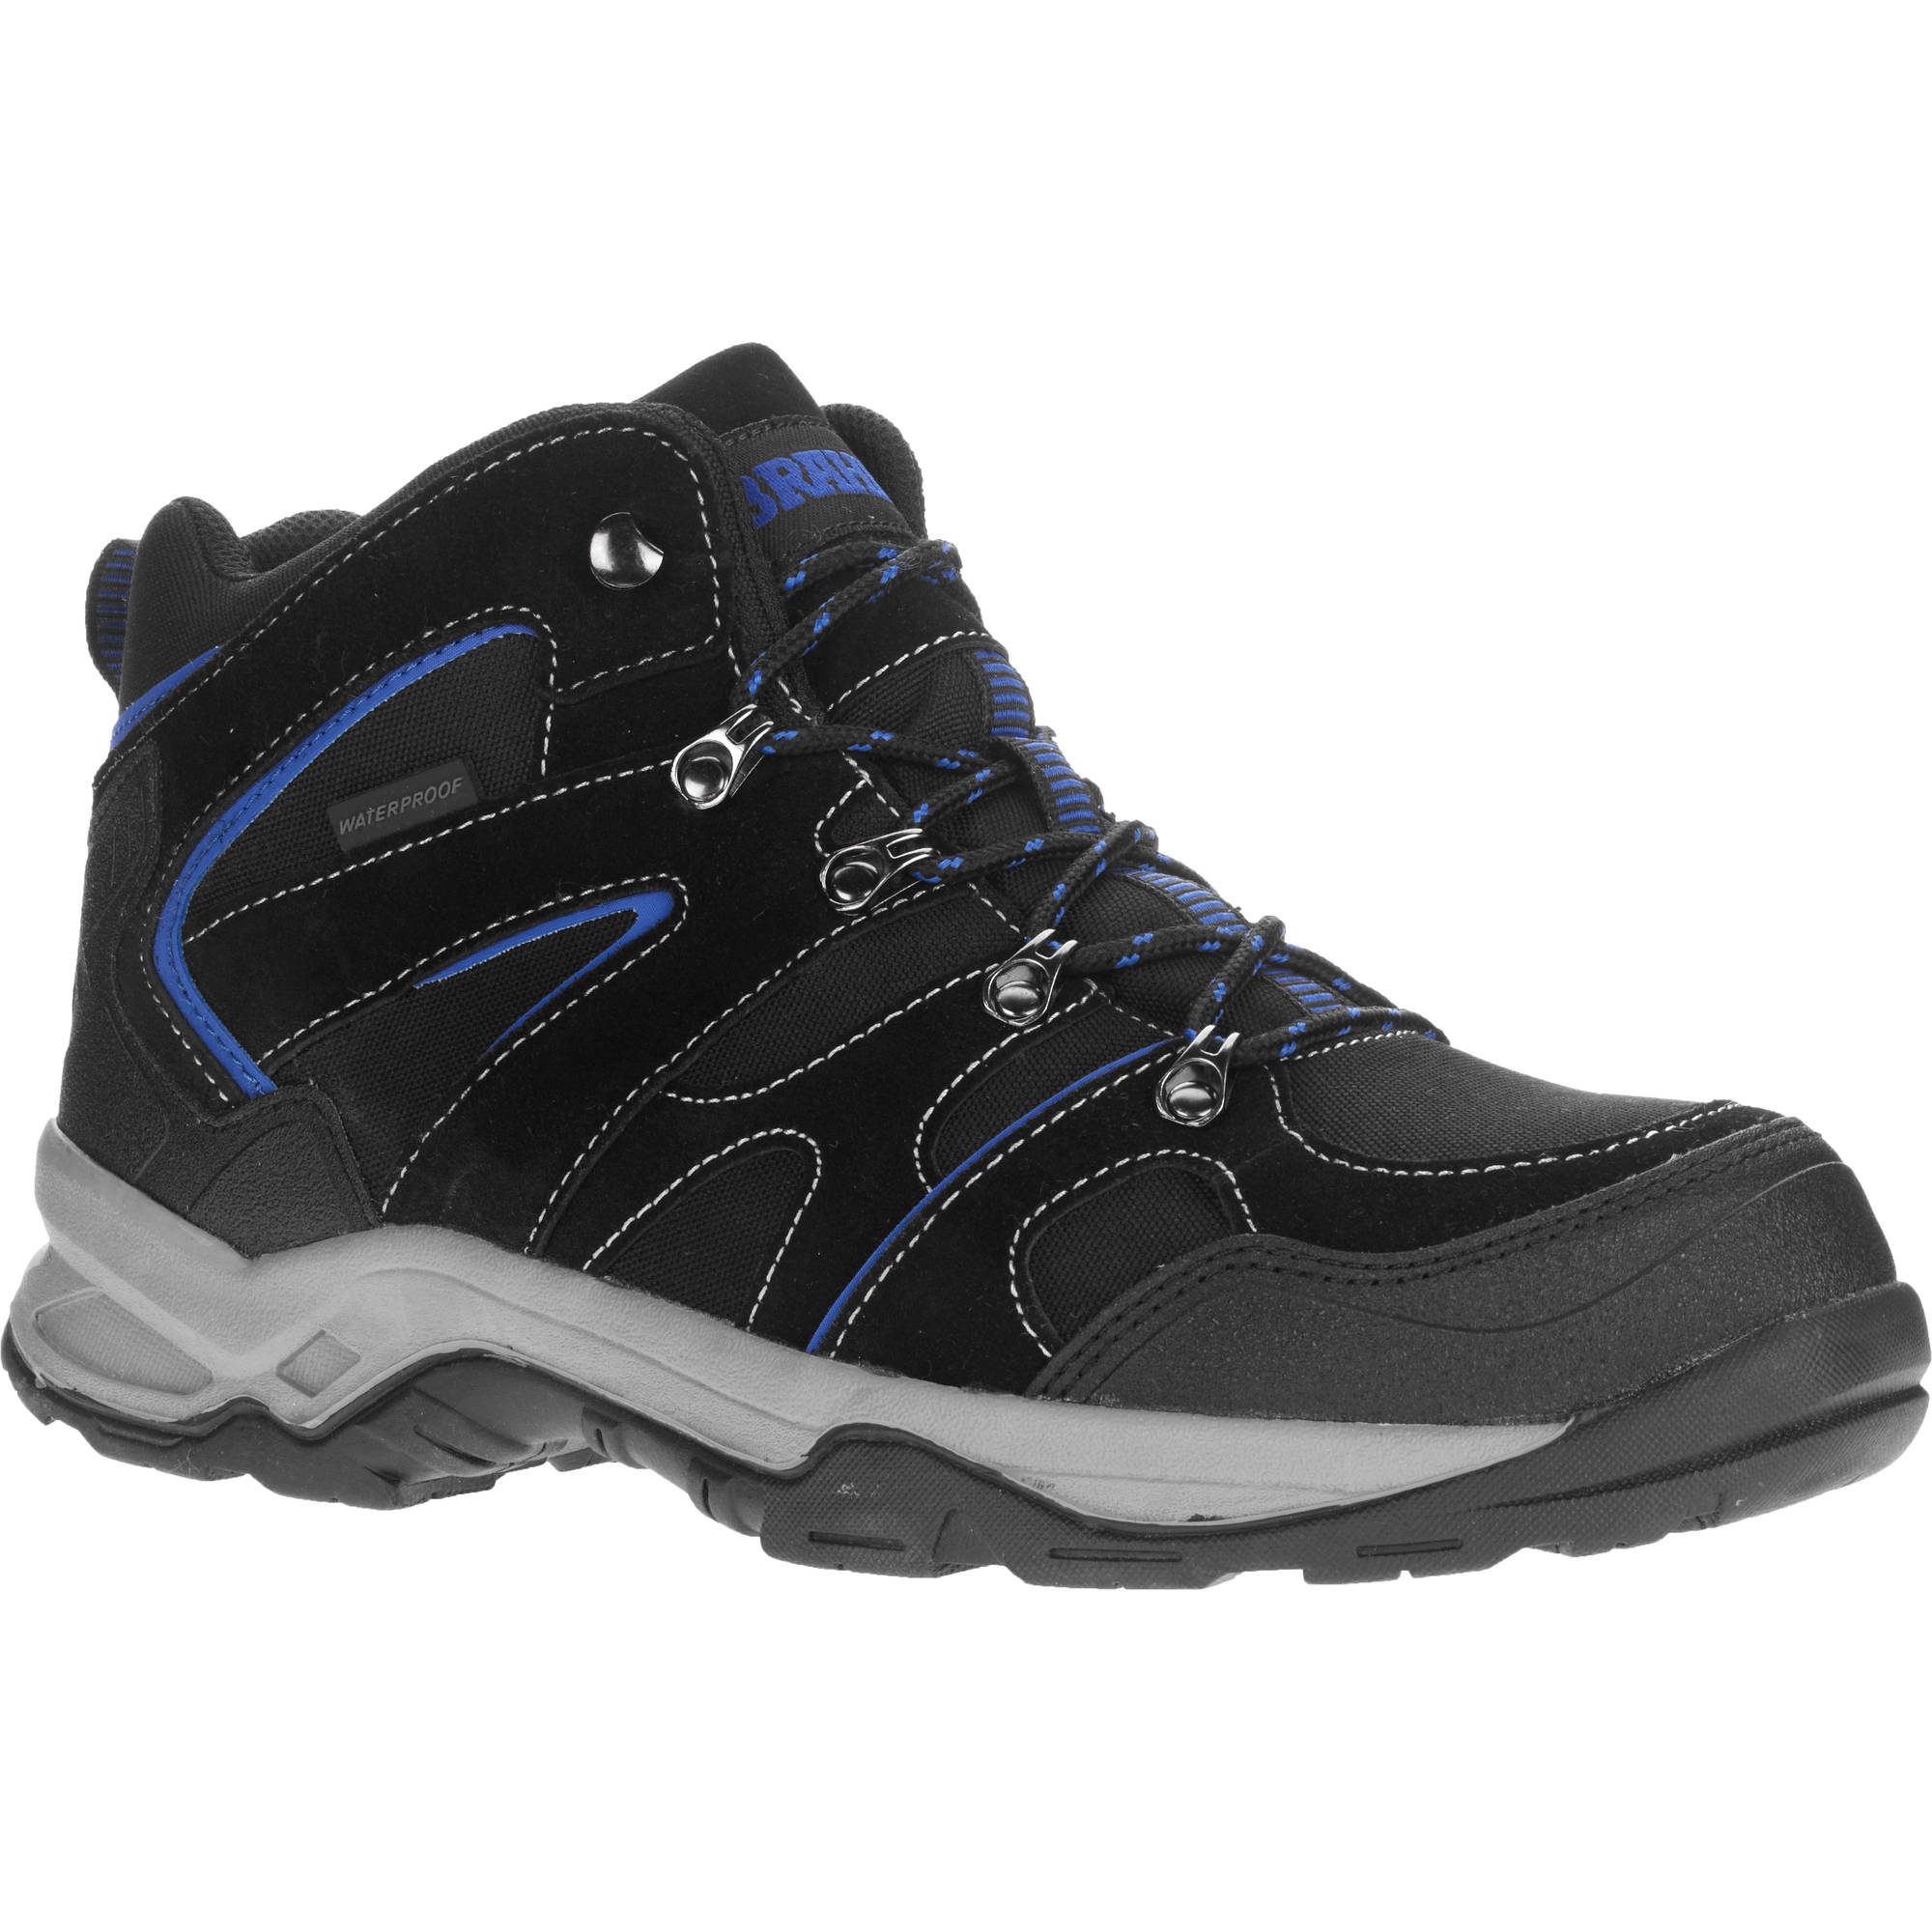 Brahma Men's Kytan Steel Toe Waterproof Hiker Work Boot - Walmart.com